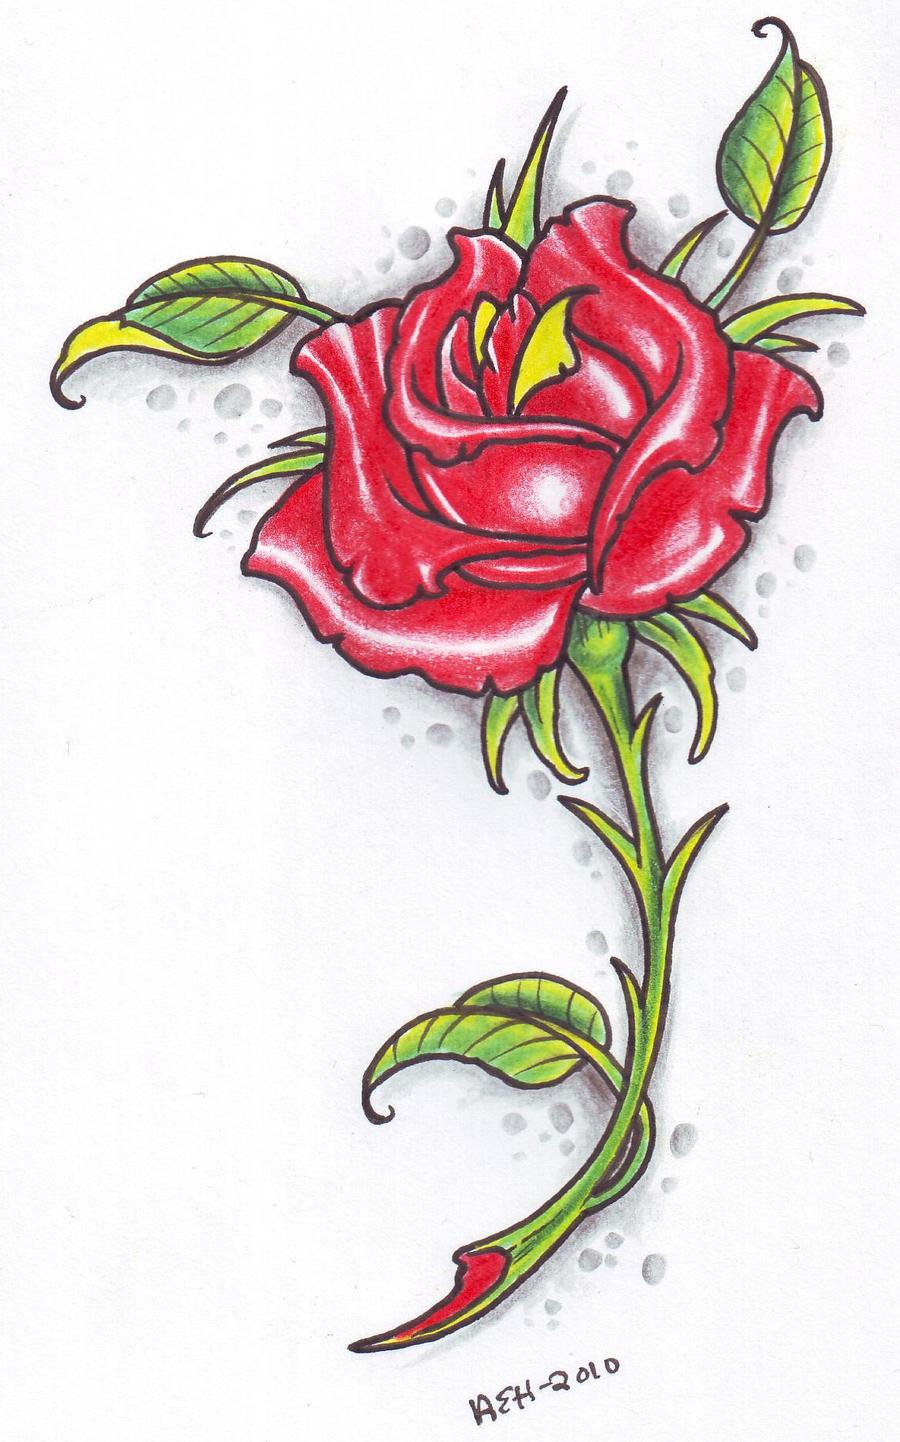 rose tattoo design 2010 by vikingtattoo on deviantart. Black Bedroom Furniture Sets. Home Design Ideas